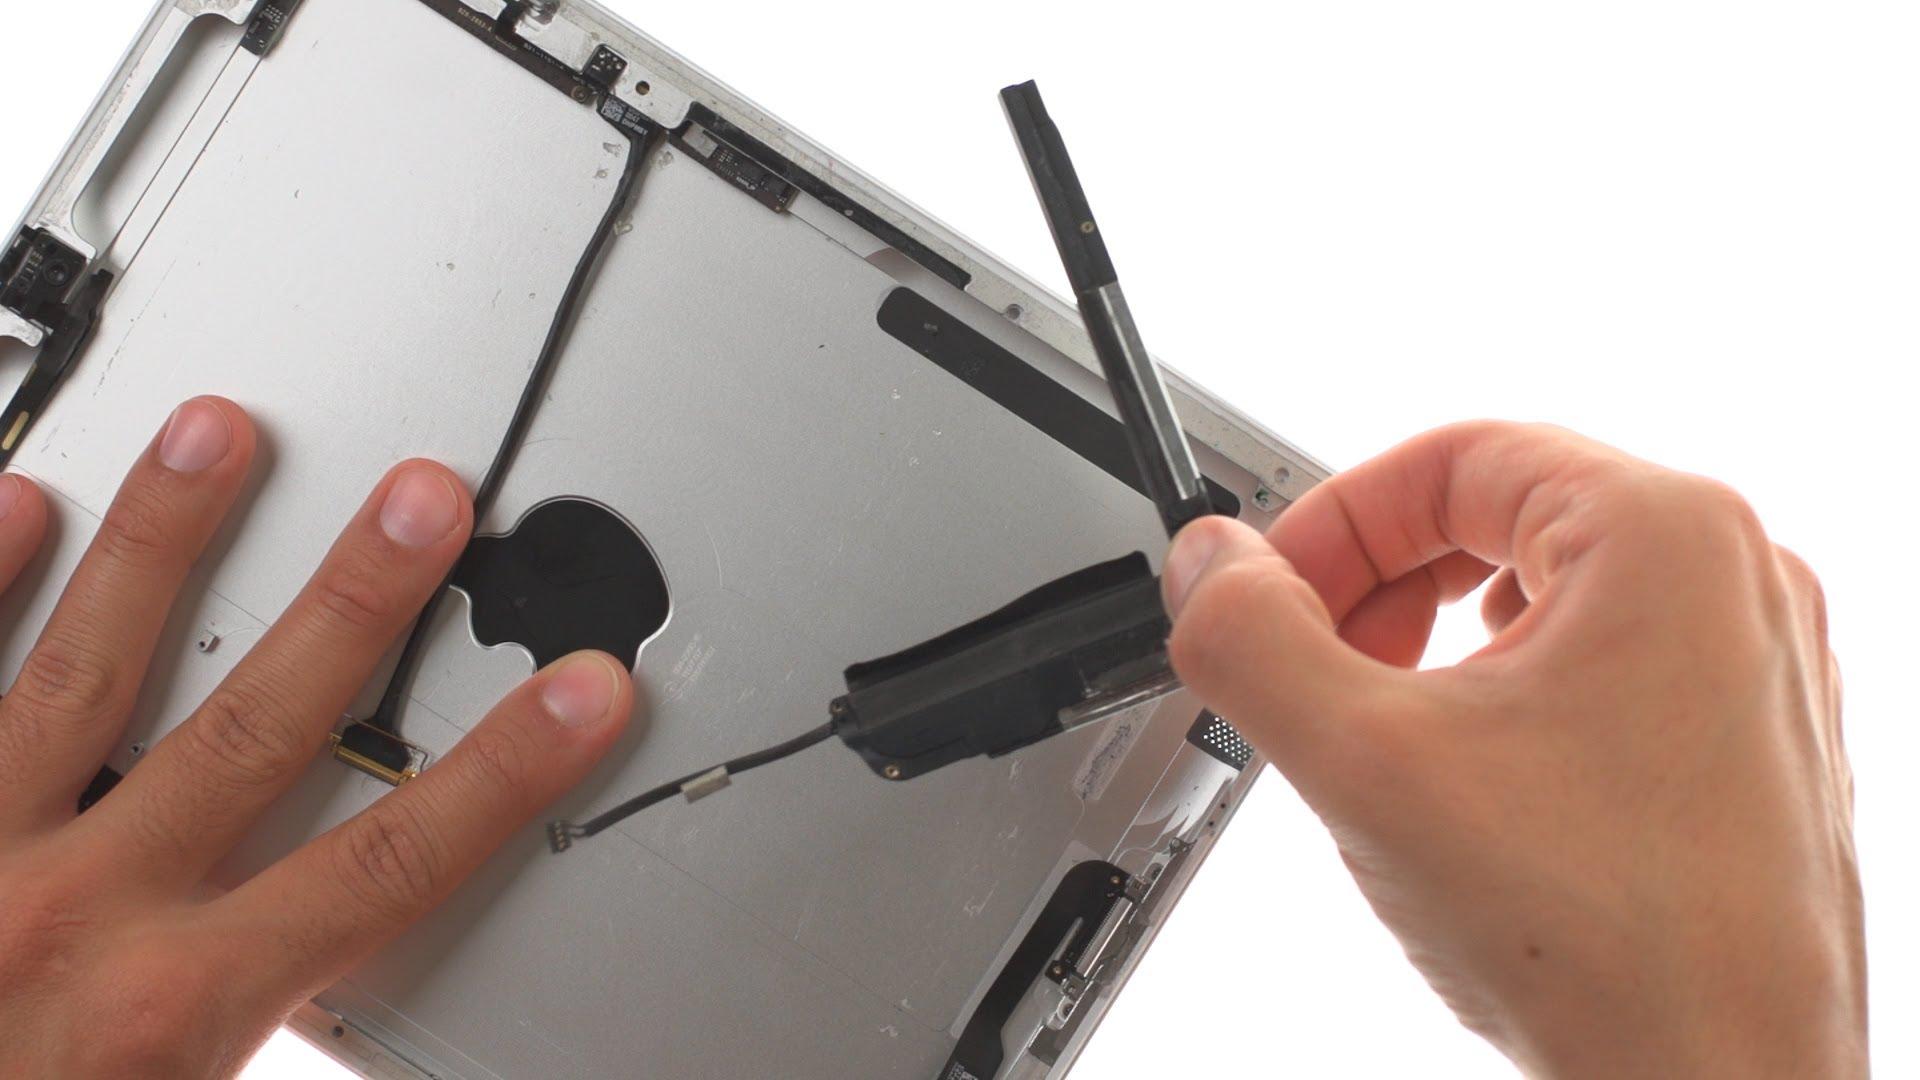 iPad2 ラウドスピーカー交換修理方法動画